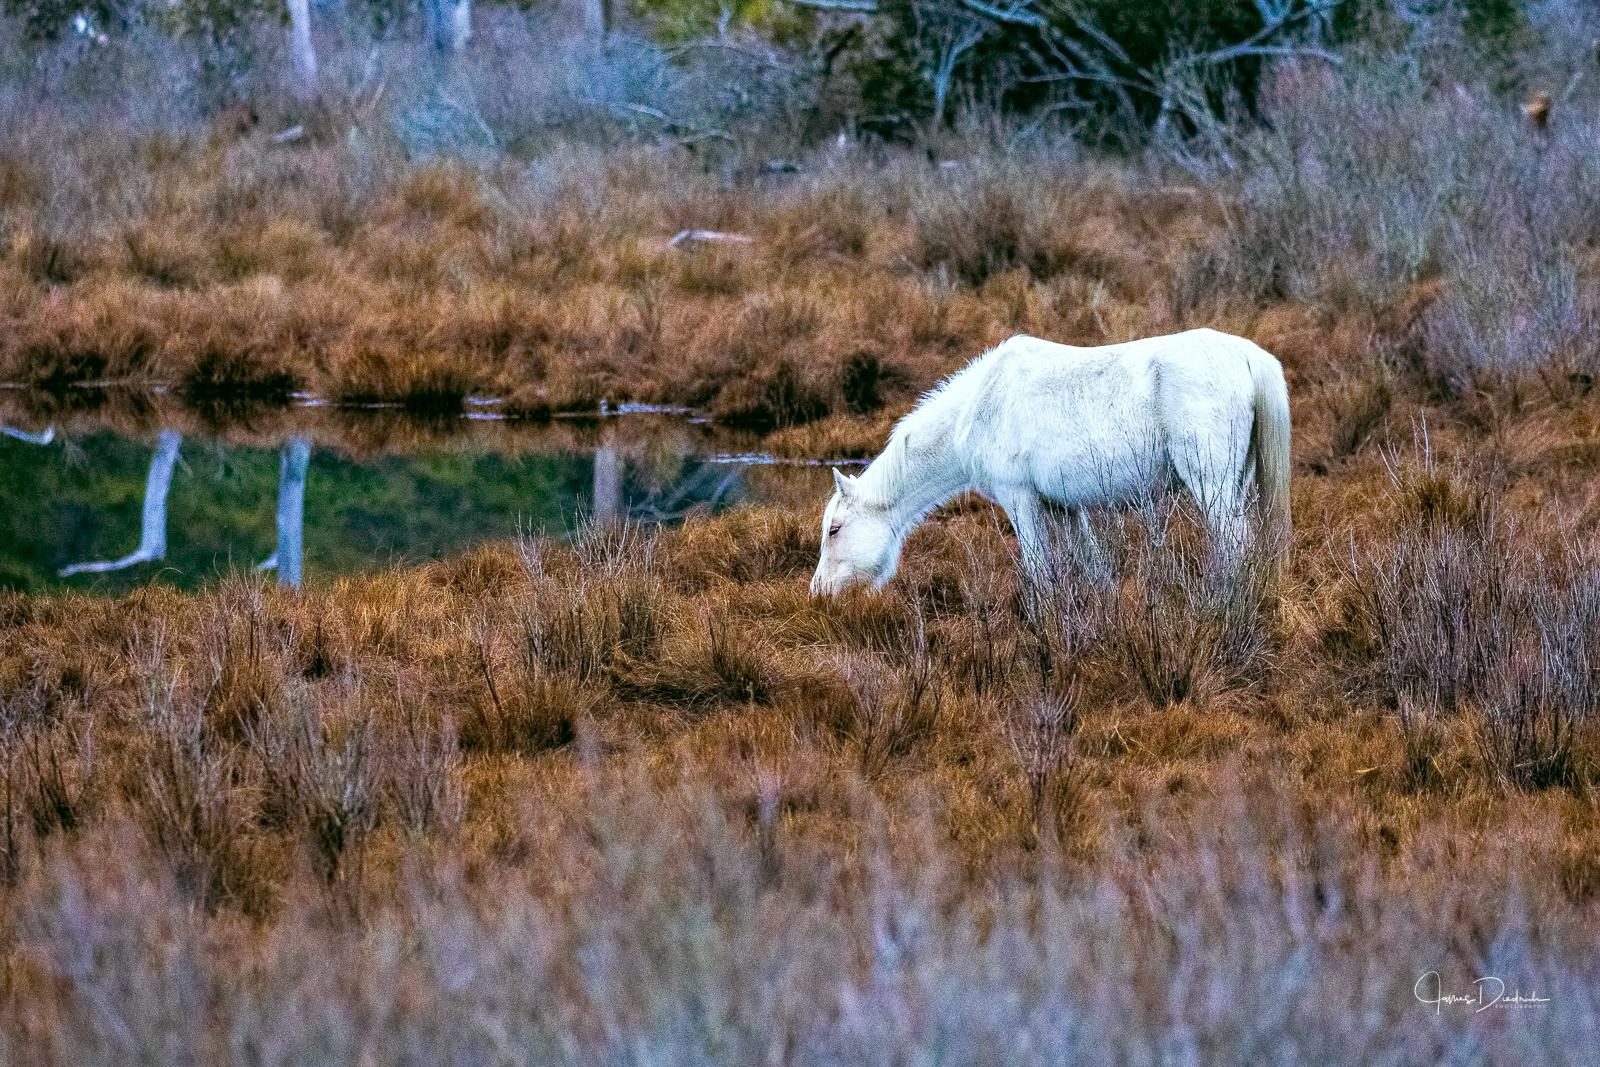 Wild horse on Chincoteague Island, VA